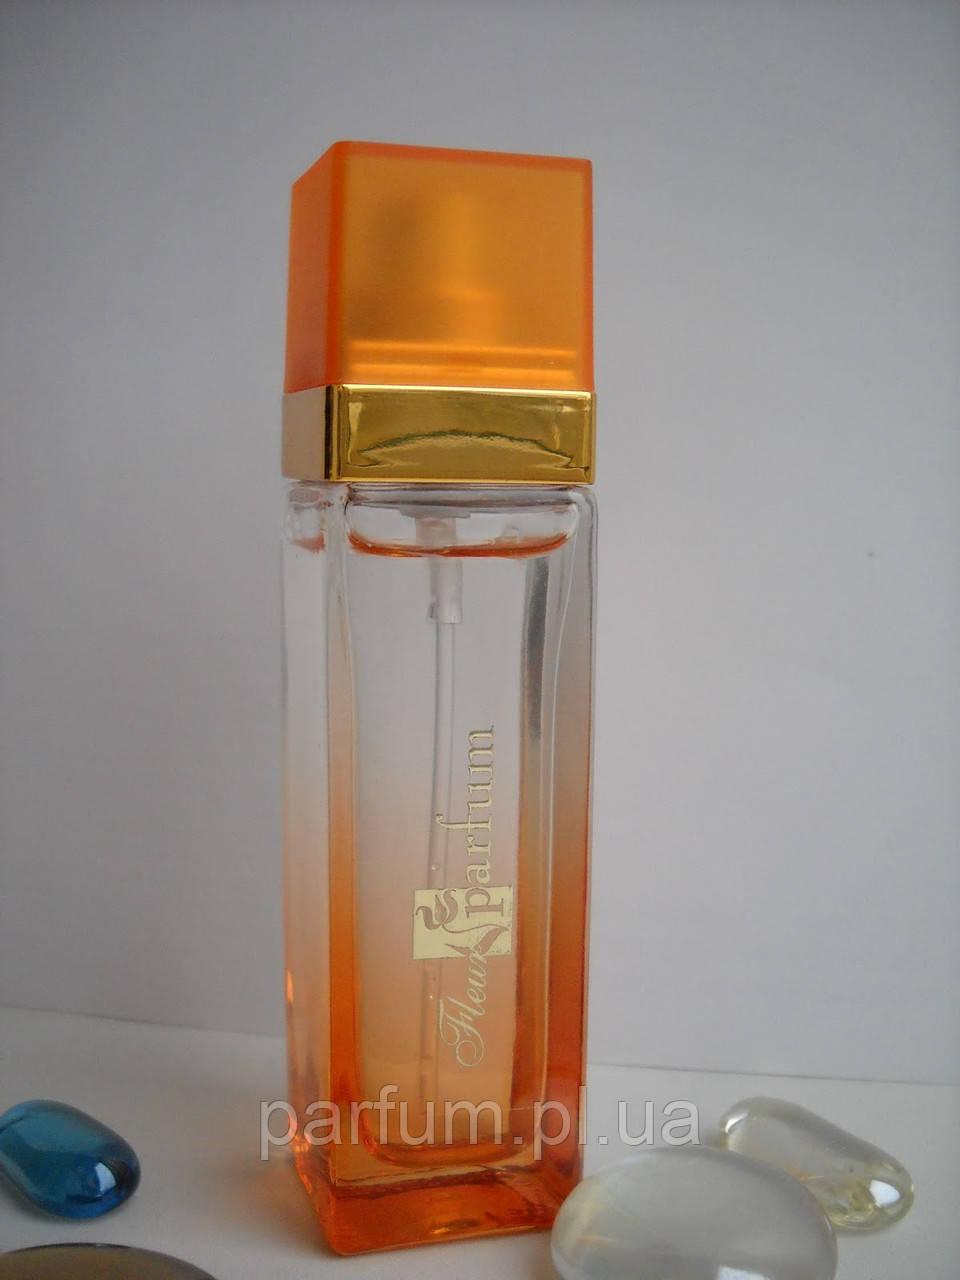 Женские духи Gucci Eau De Parfum II F65